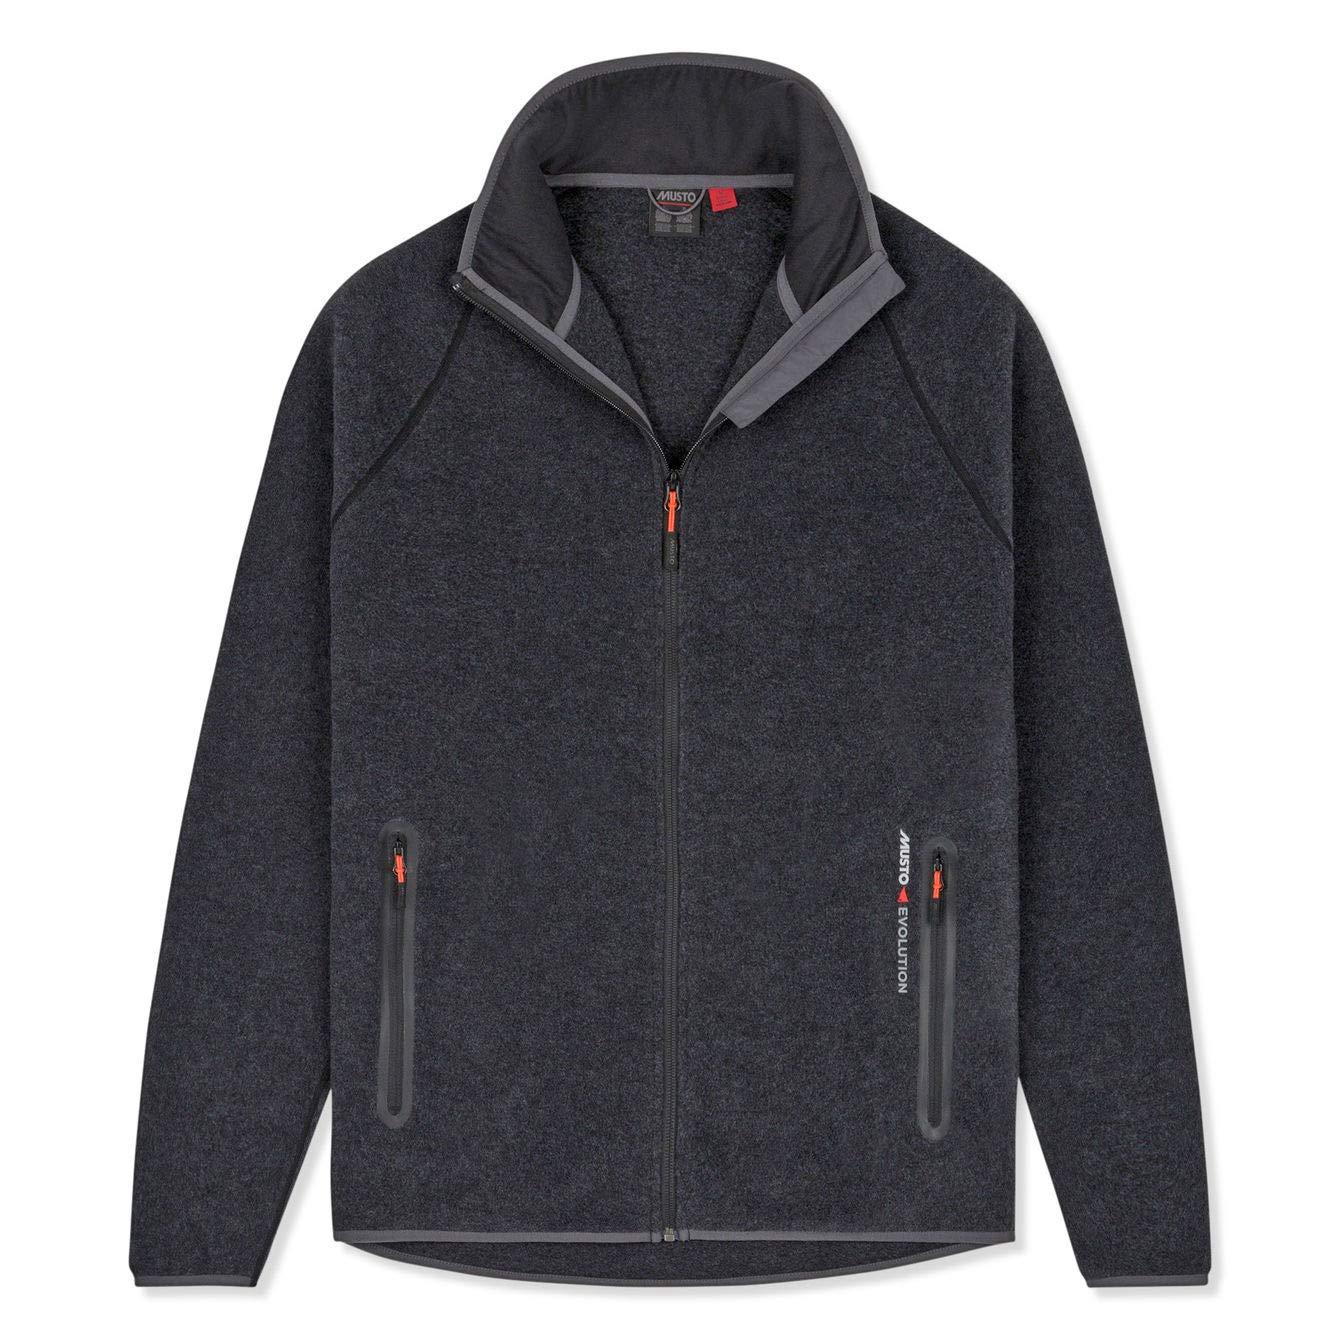 M Musto Mens Essential Polartec Warm Fleece Coat Jacket CharcoalTwo hand pockets